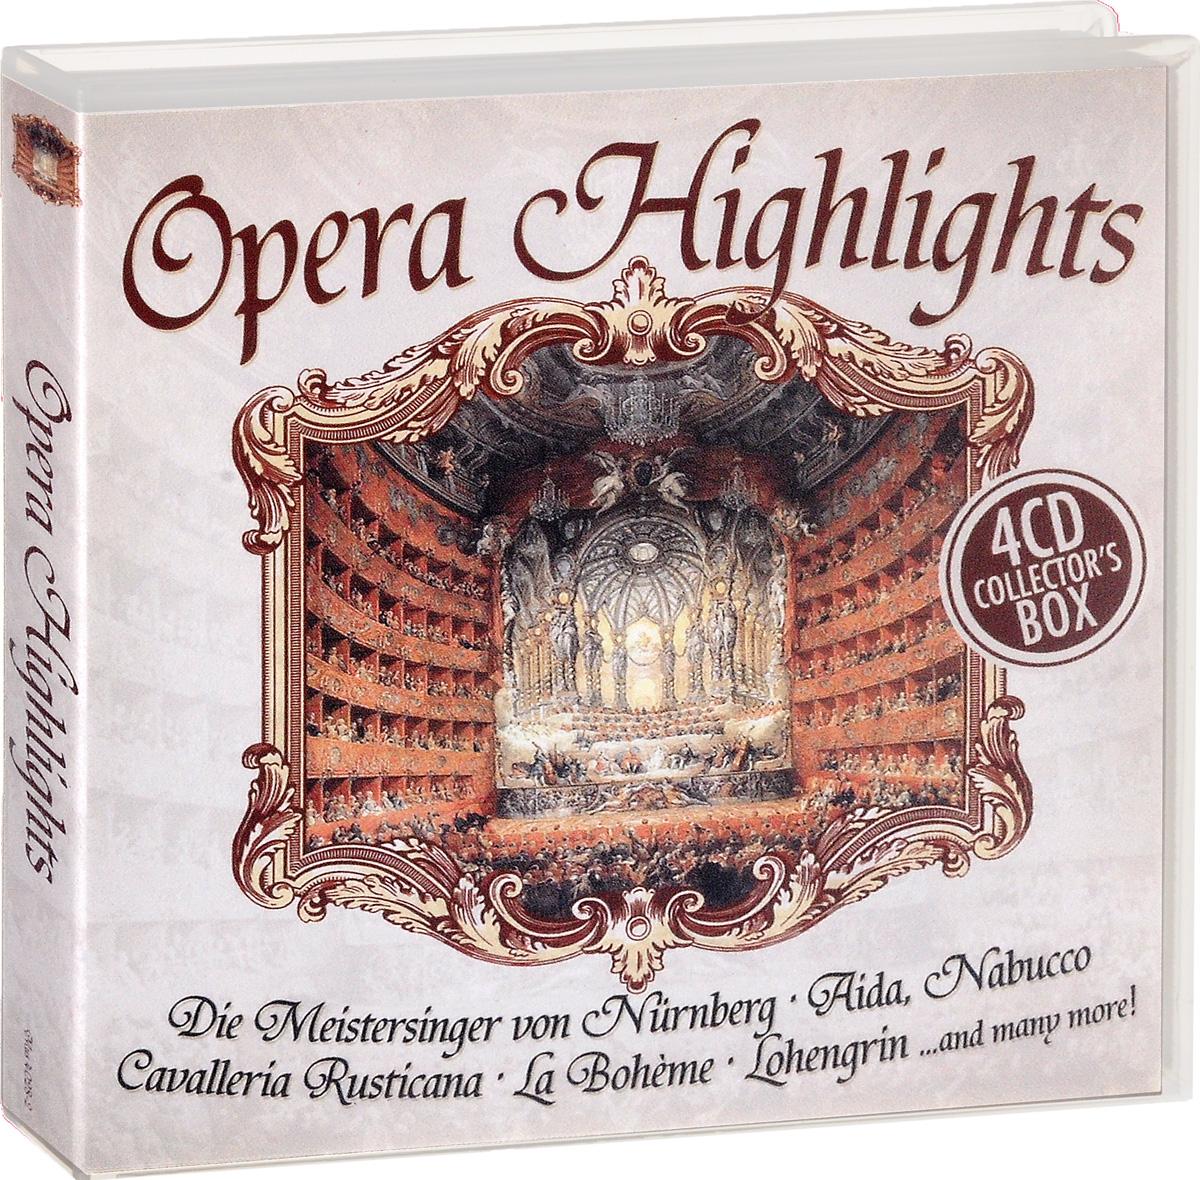 Фото - Opern Highlights / Opera Highlights (4 CD) klassik highlights in classic 4 cd